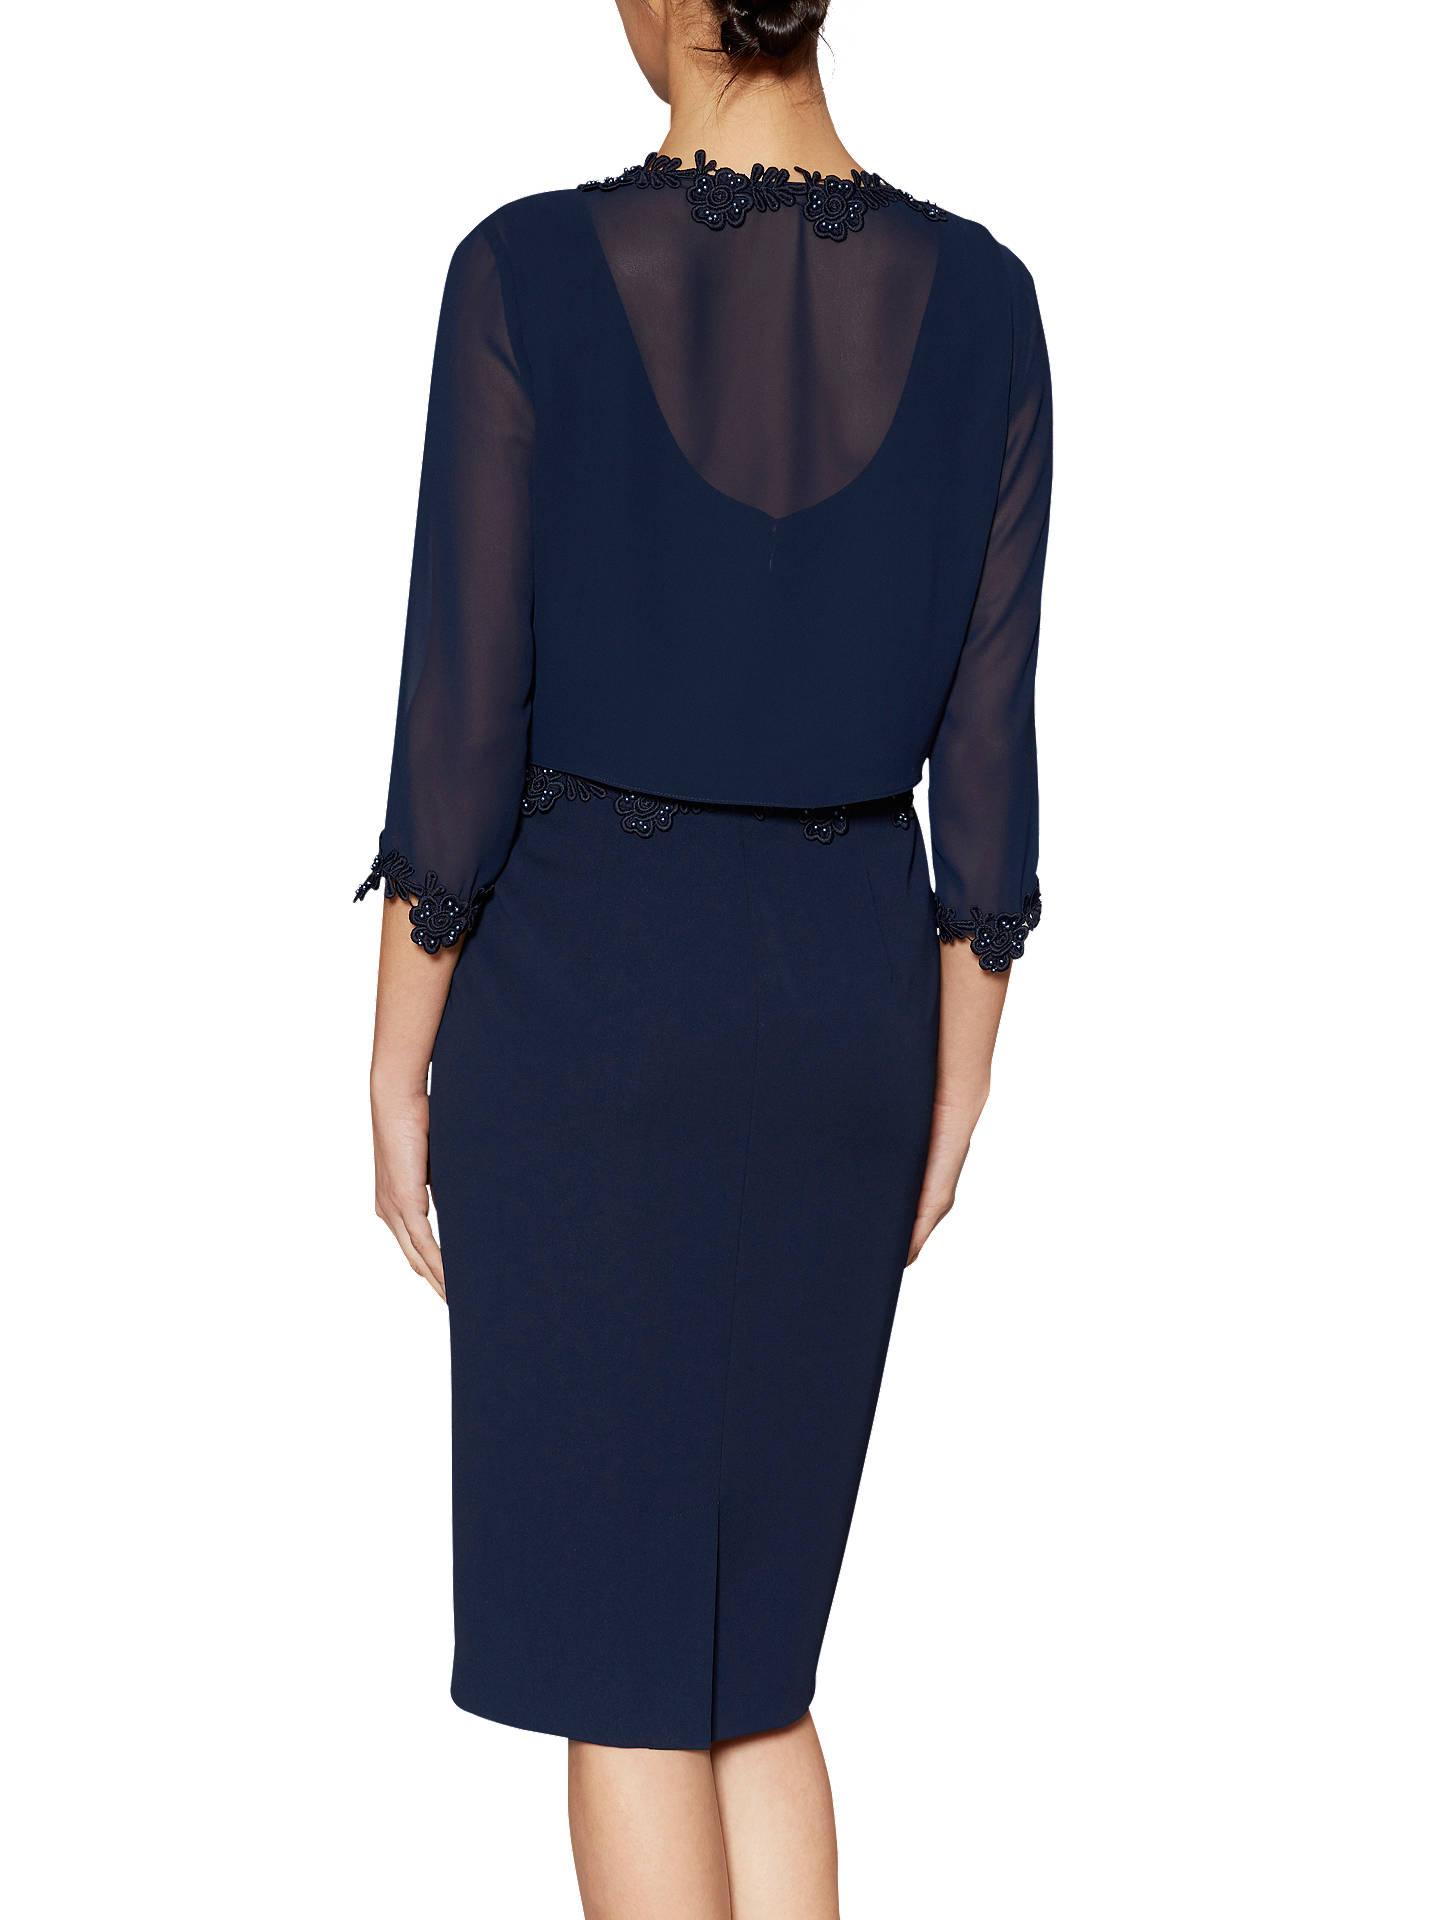 8e4af3f7846c2e ... Buy Gina Bacconi Crepe Dress And Chiffon Jacket With Guipure Trim